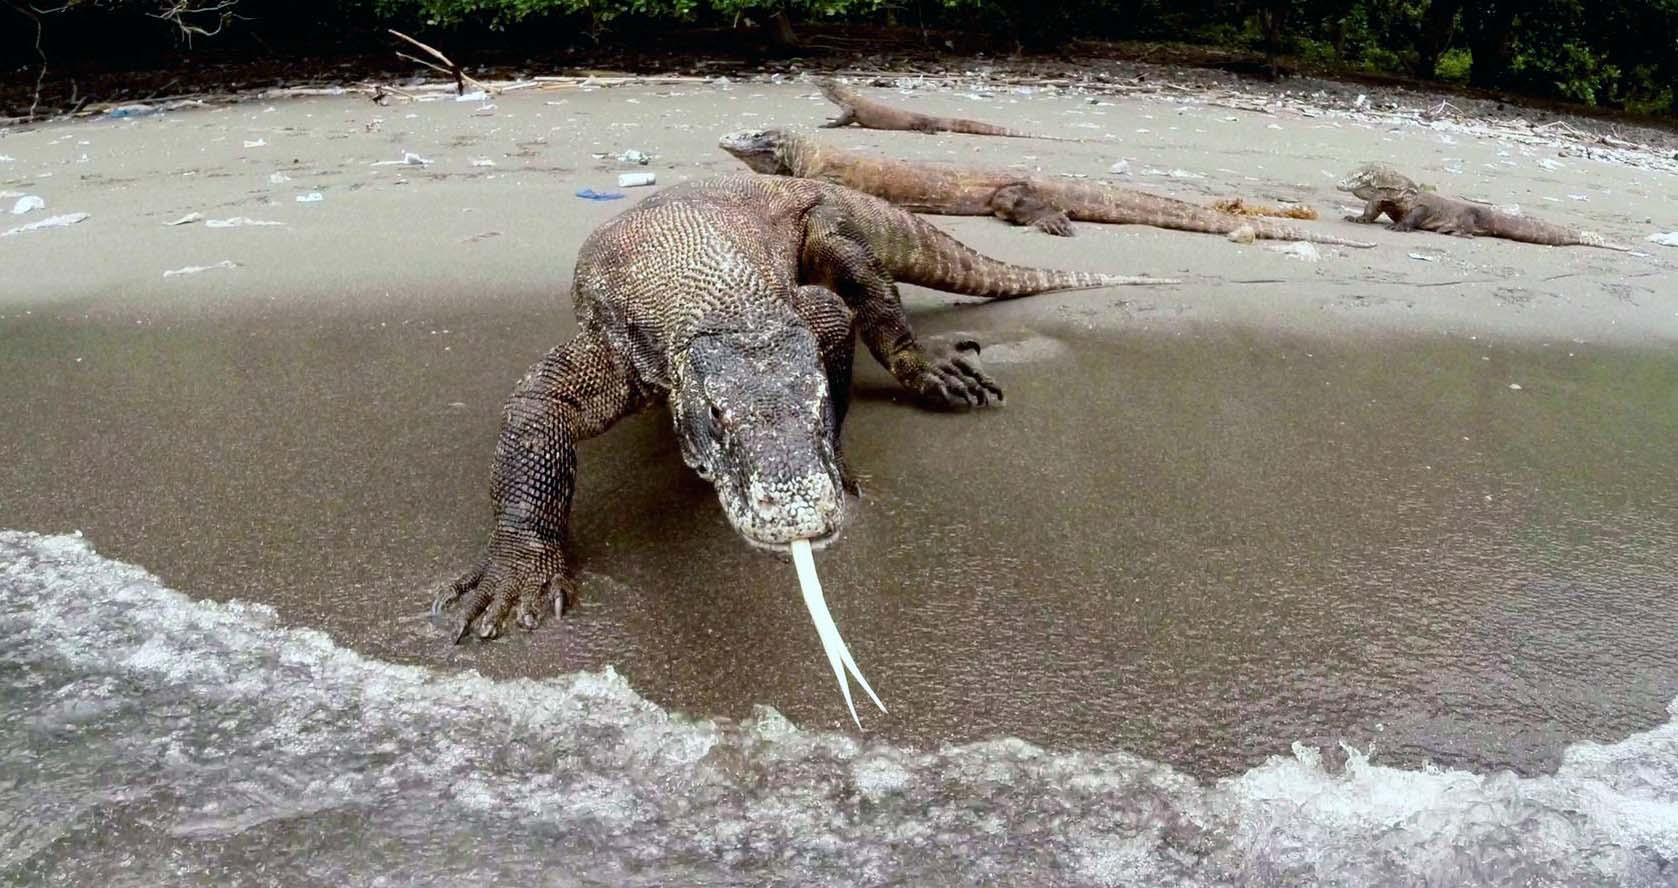 Komodo Dragon on beach from boat into camera Litter 2.7K GoPro 25p 24 3 14-01-1453.jpg